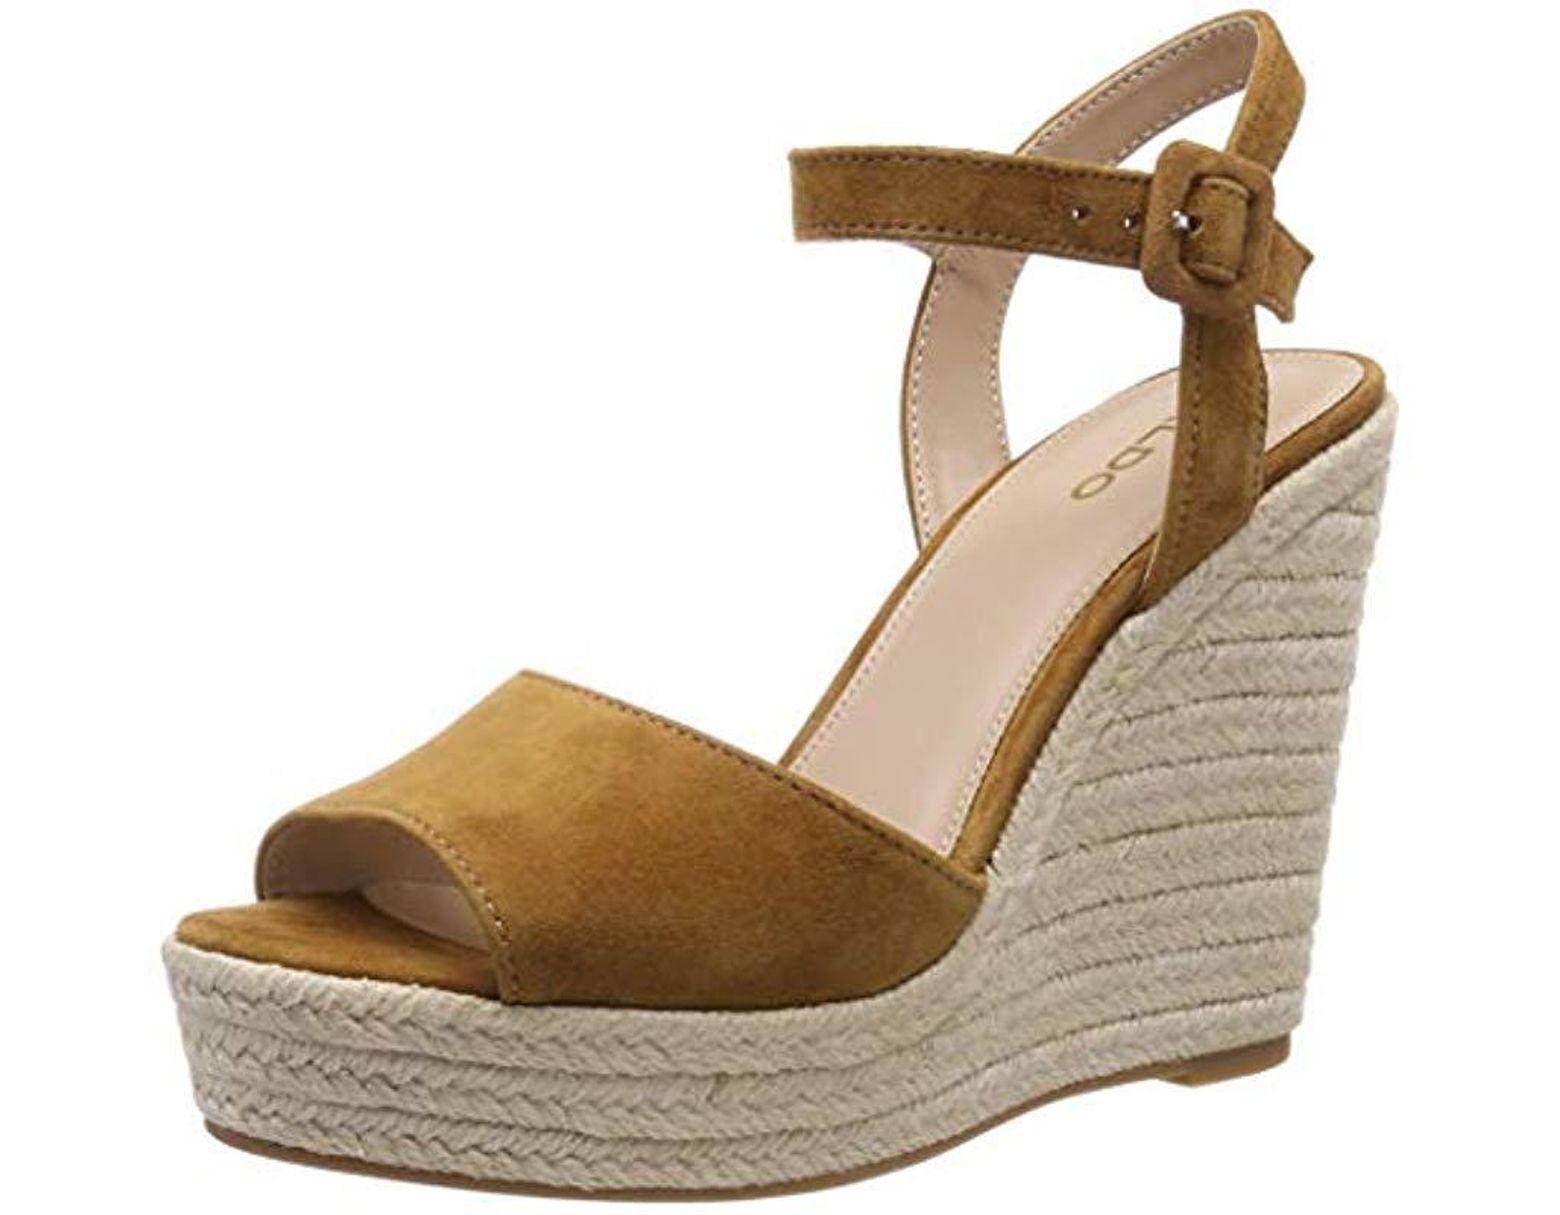 8e61f282a ALDO Ybelani Ankle Strap Sandals in Brown - Save 58% - Lyst